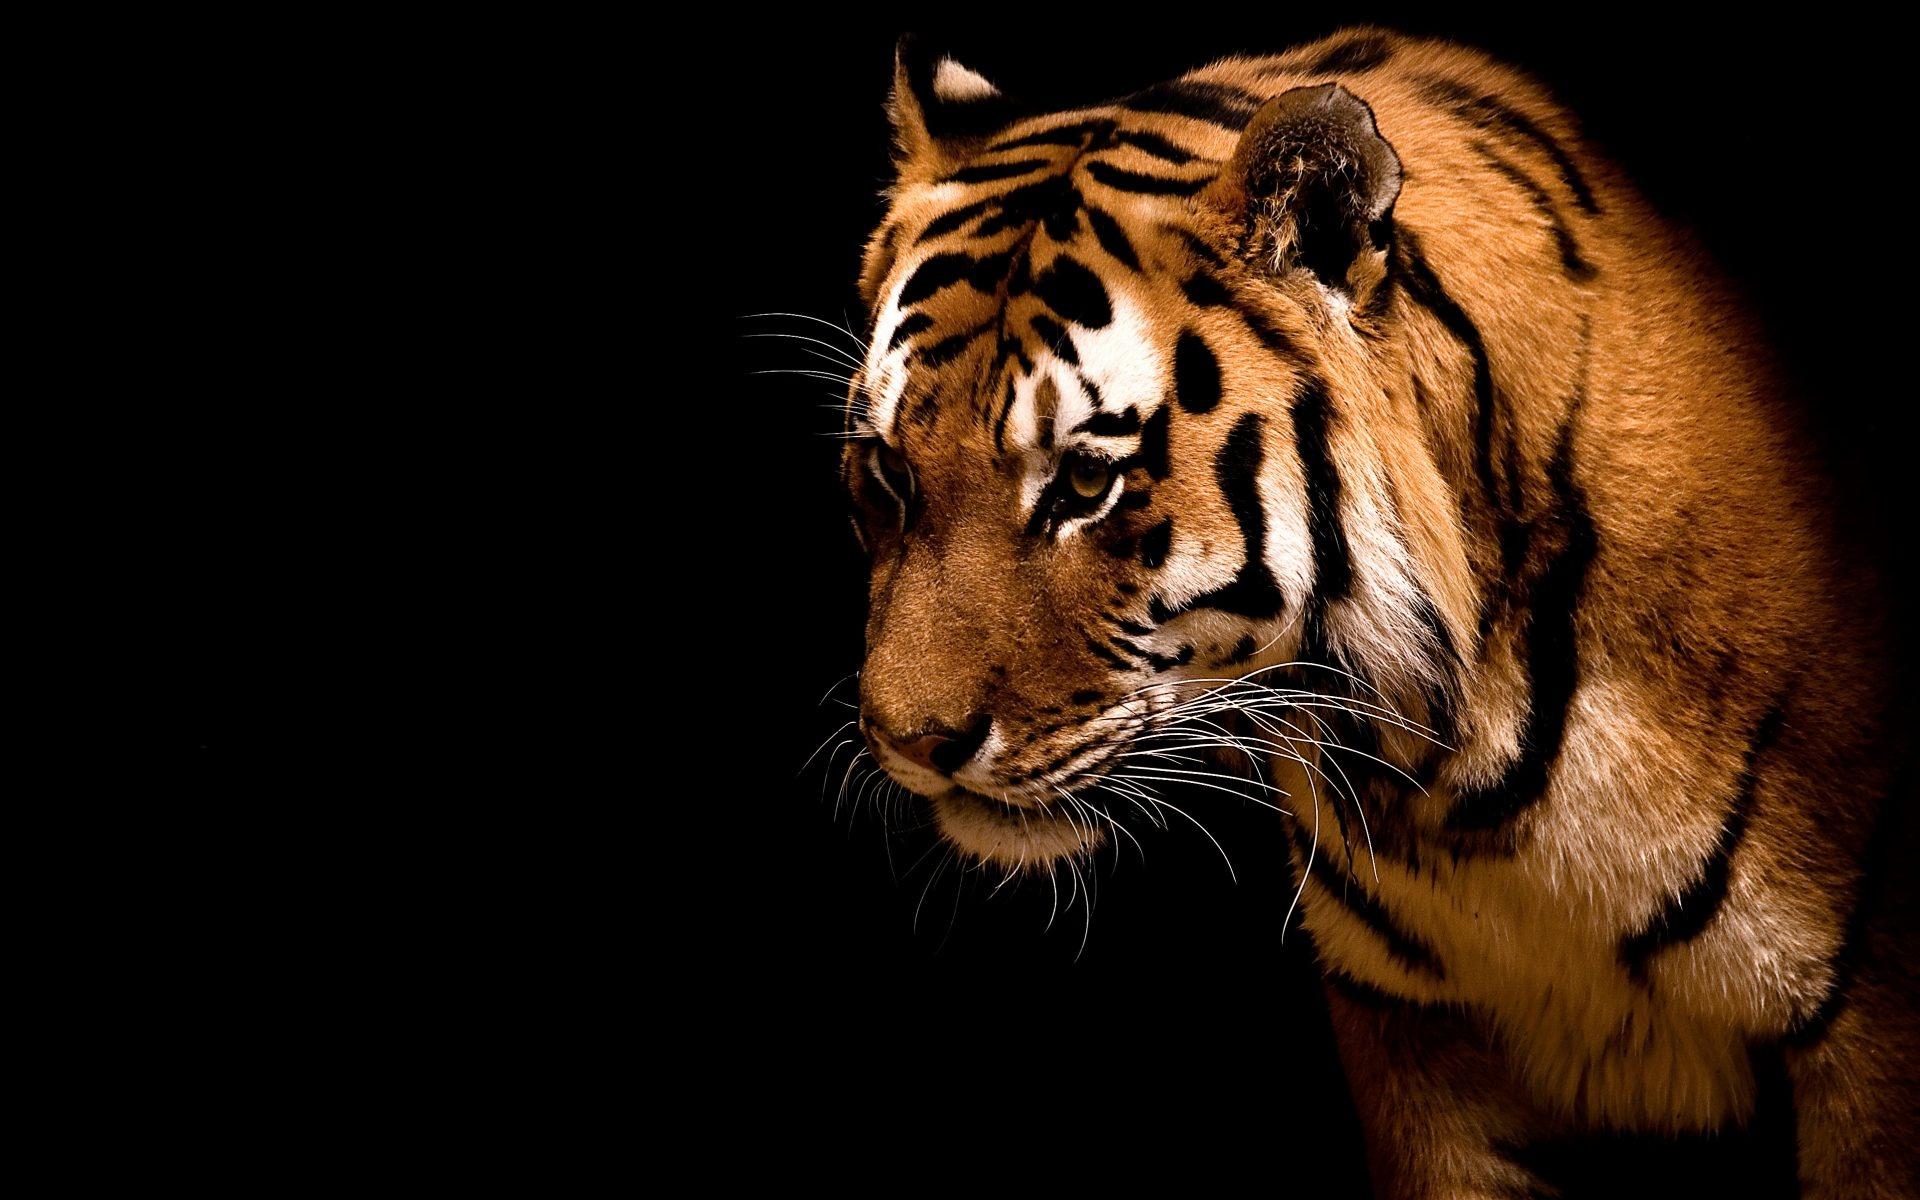 black tiger animal - photo #13